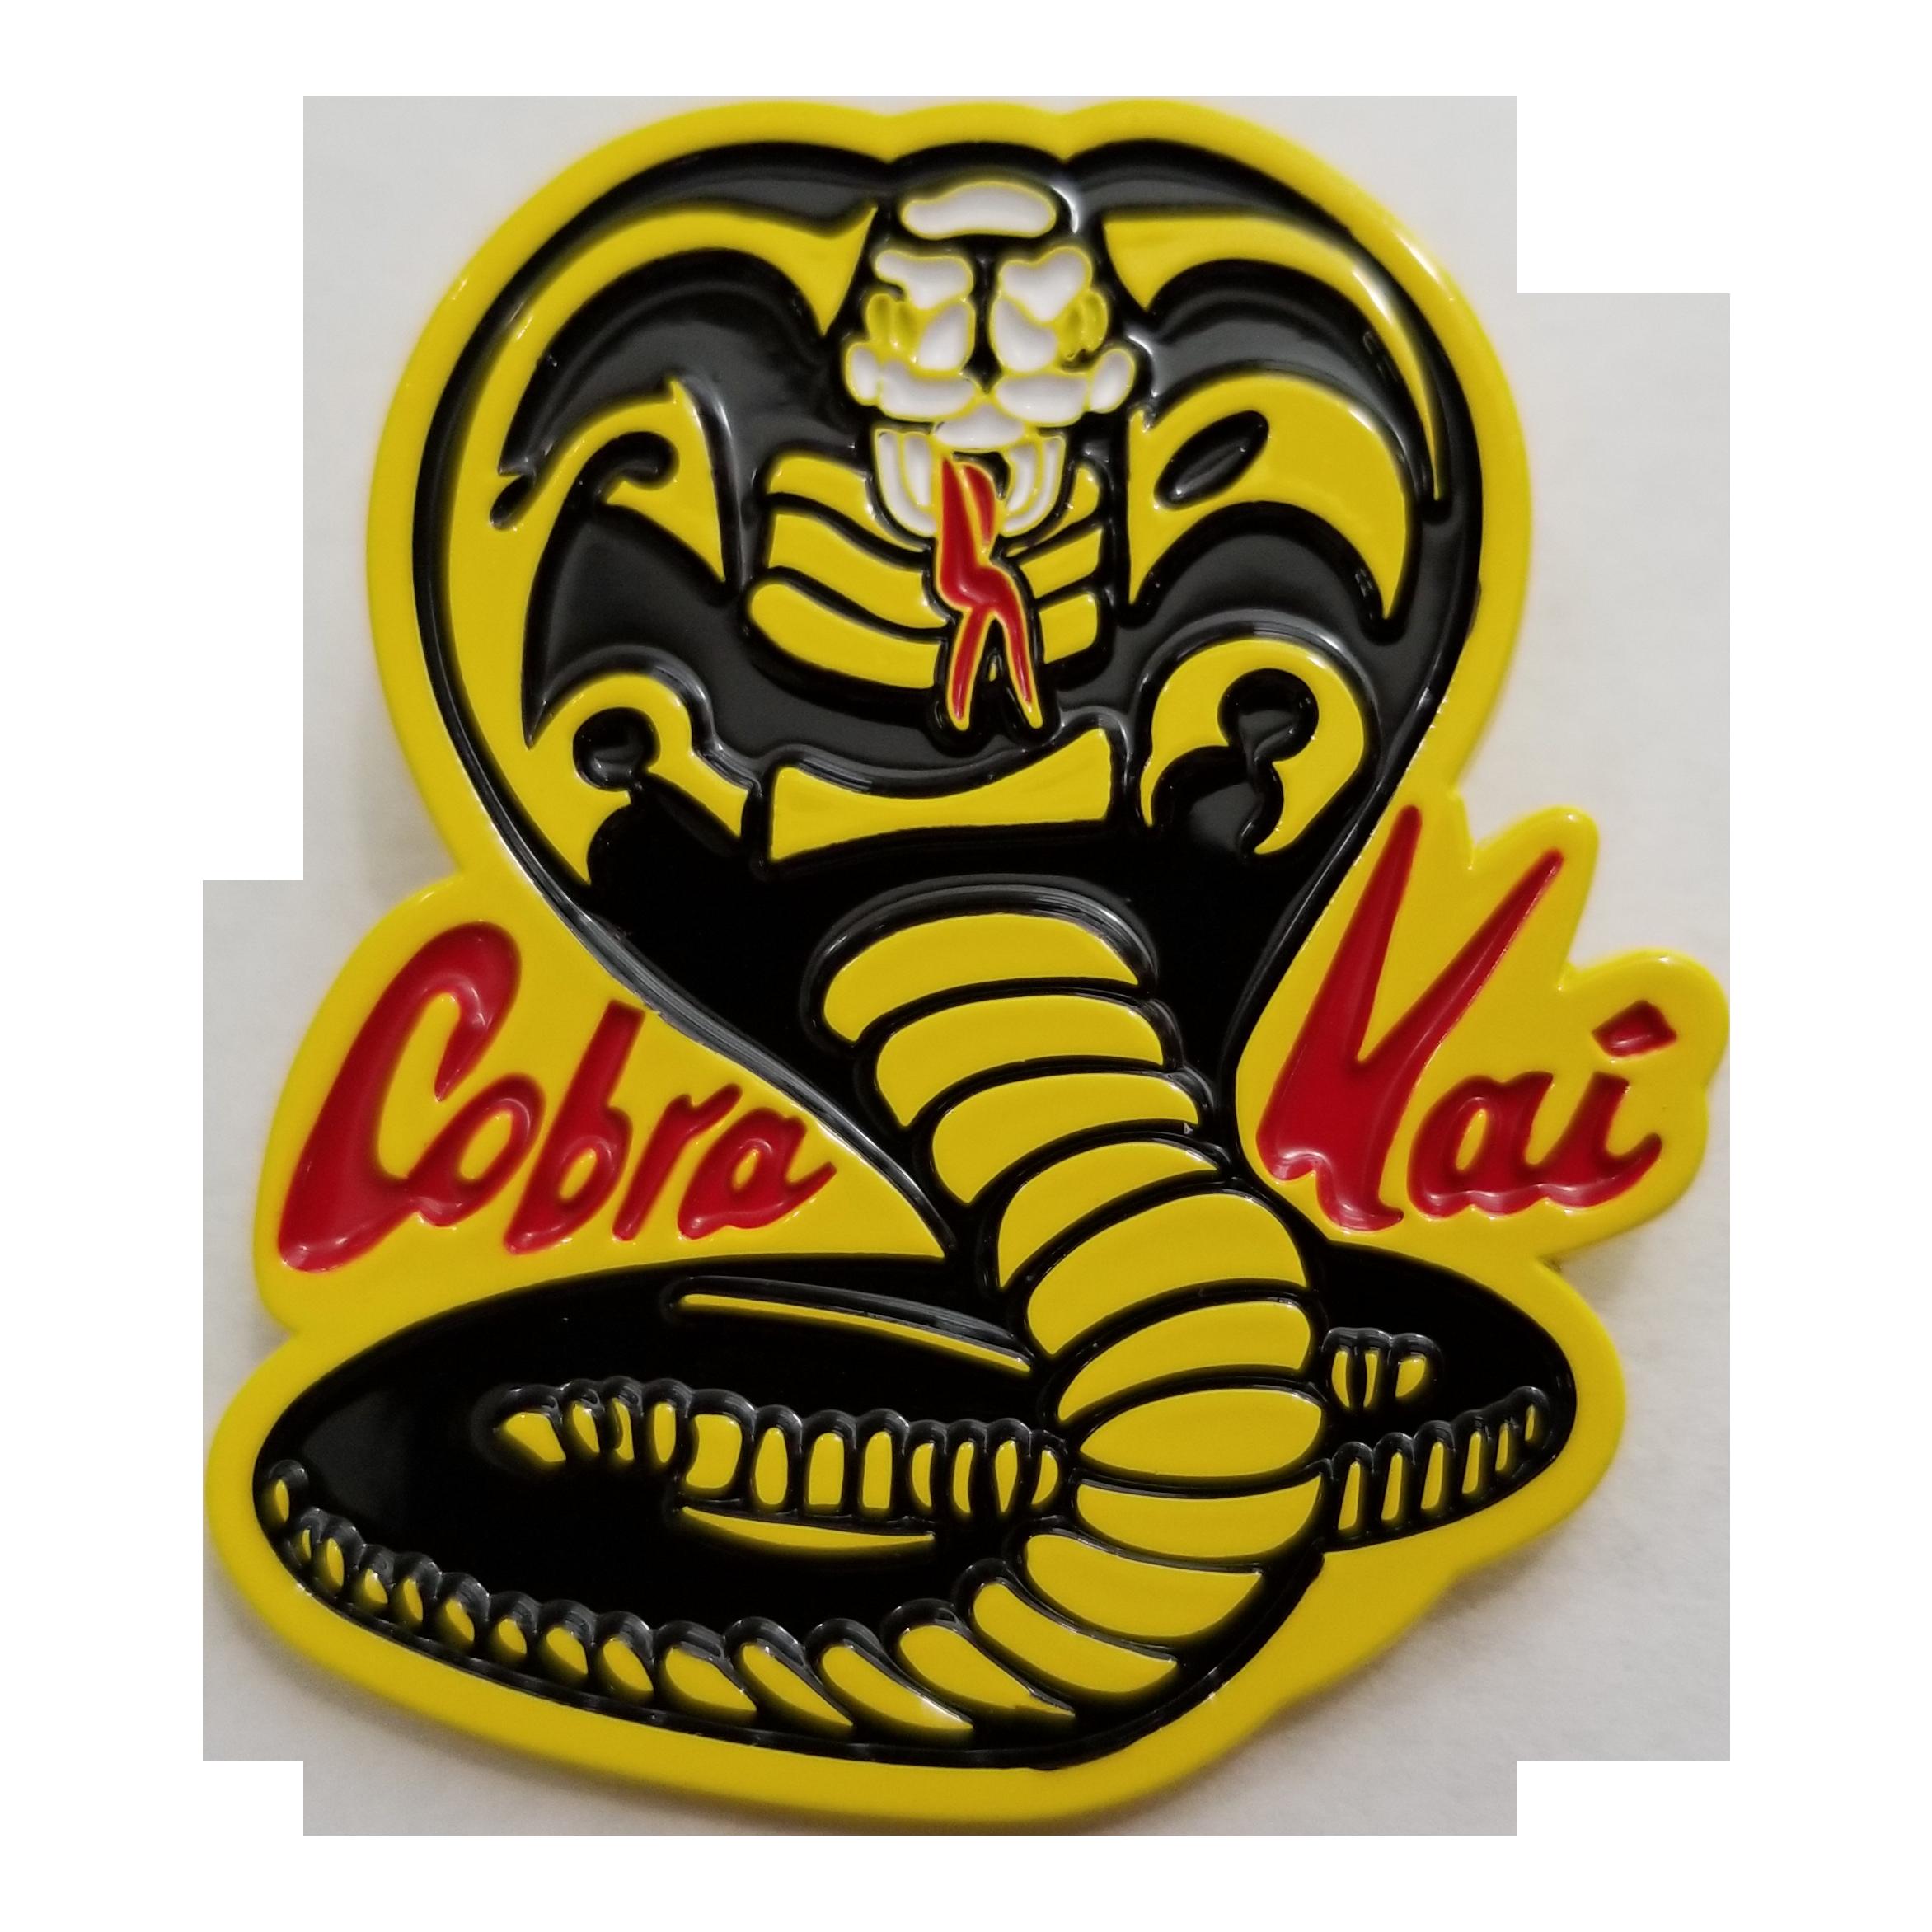 The Karate Kid Cobra Kai Logo Enamel Pin Pegatinas Pegatinas De Vinilo Disenos Para Camisetas